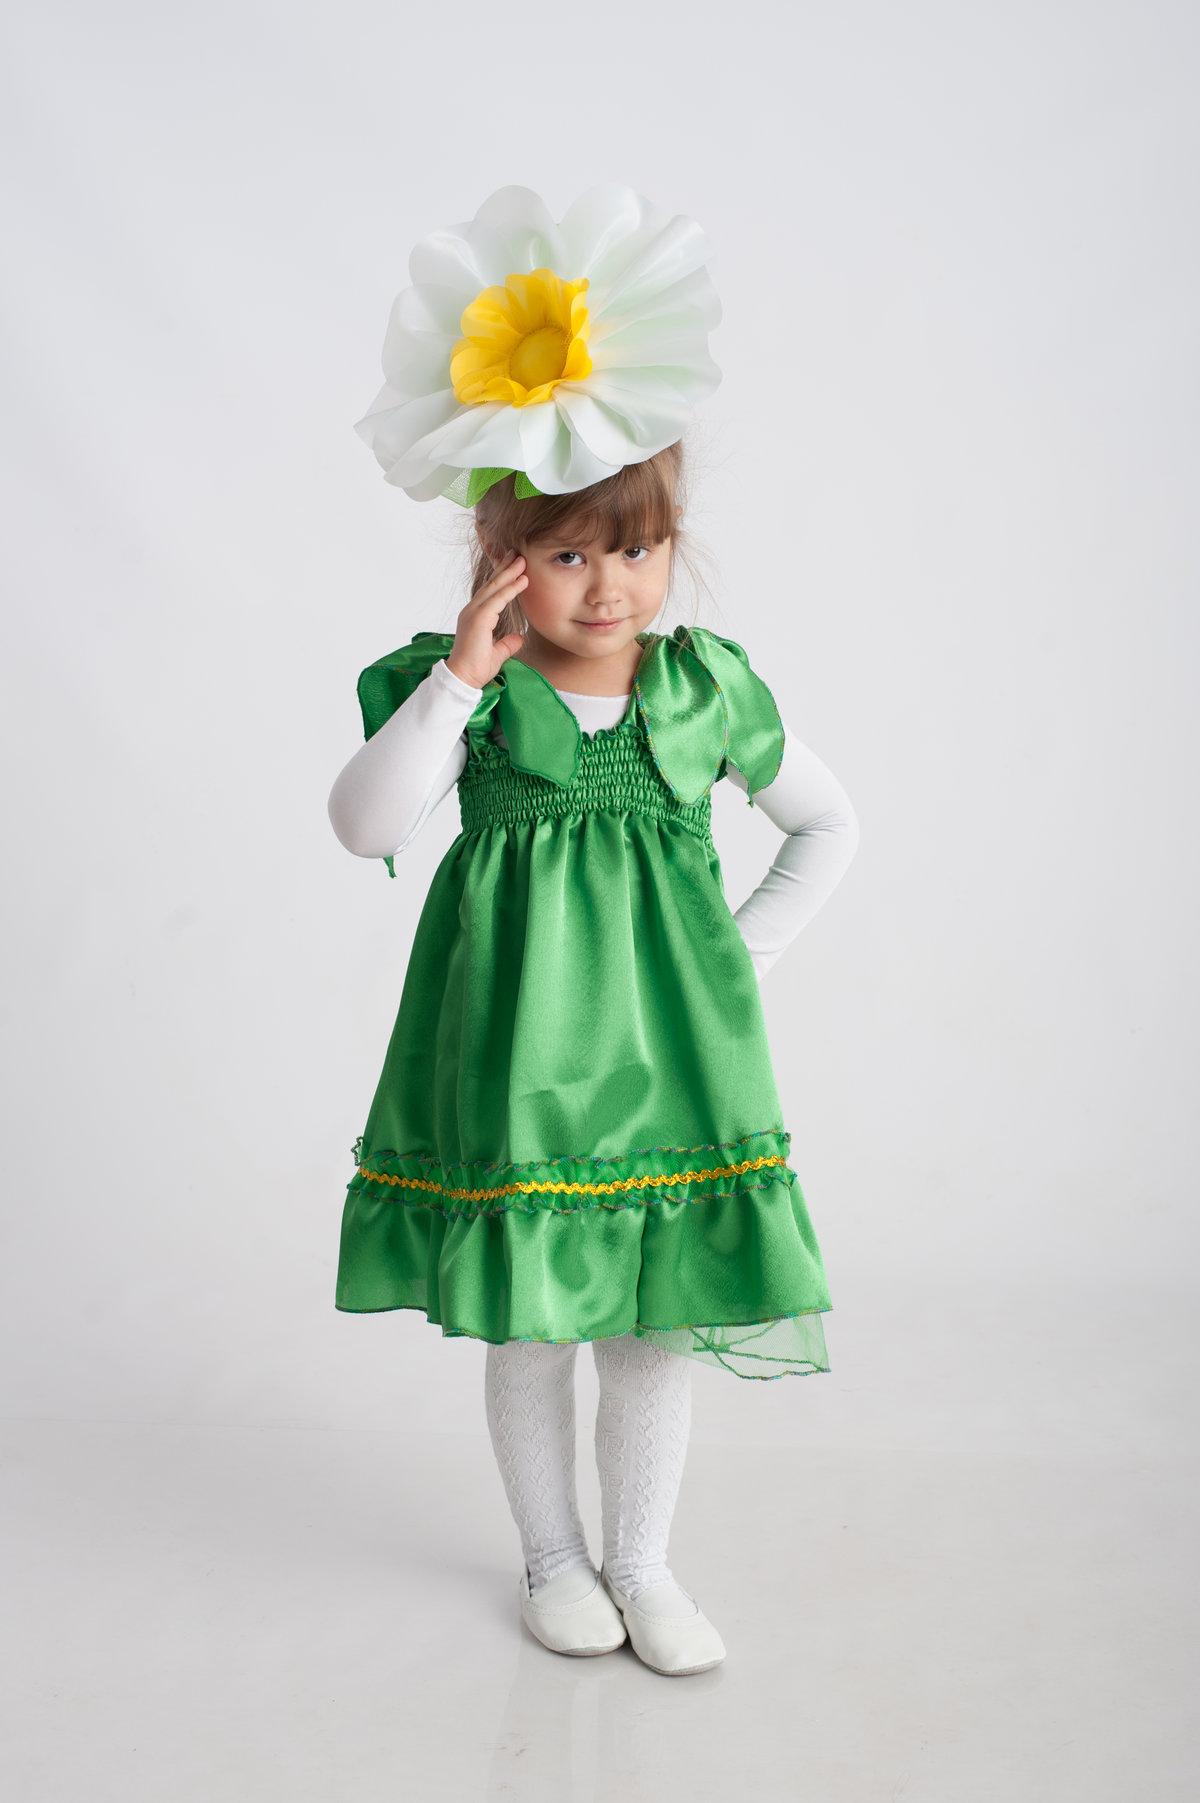 Василёк костюм для девочки своими руками